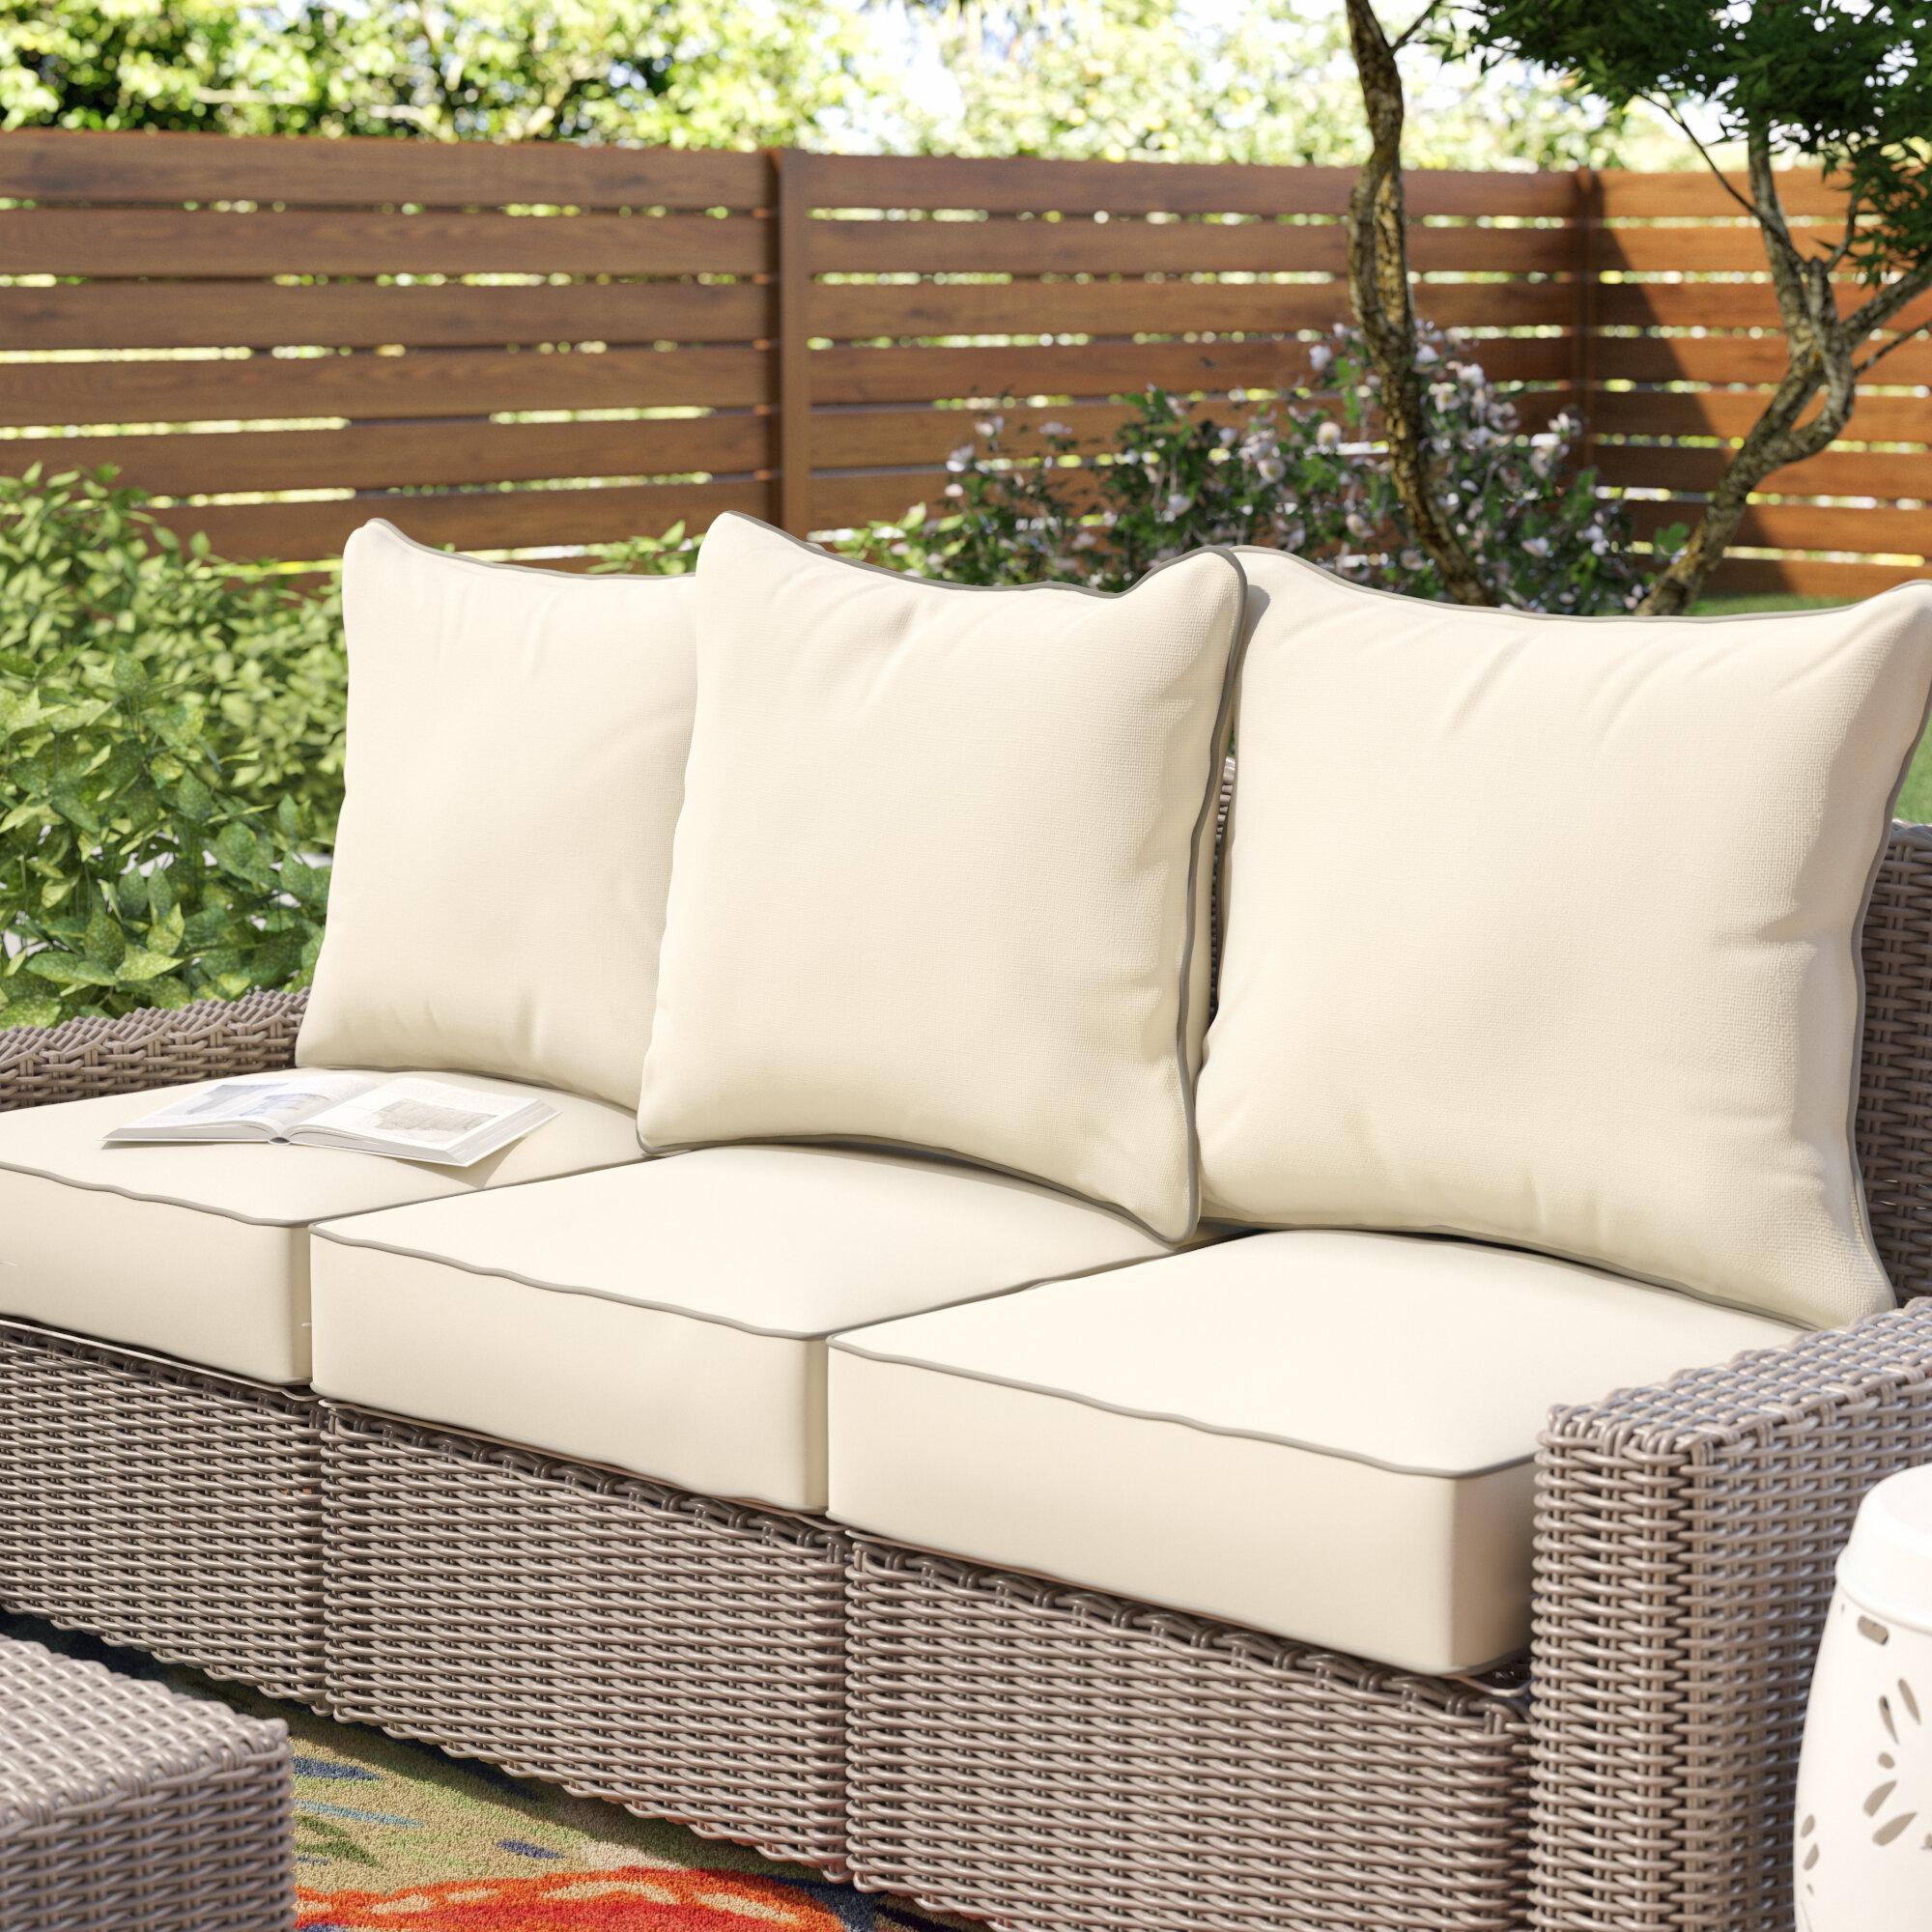 Beachcrest Home 6 Piece Piped Indoor Outdoor Sunbrella Sofa Cushion Set Reviews Wayfair